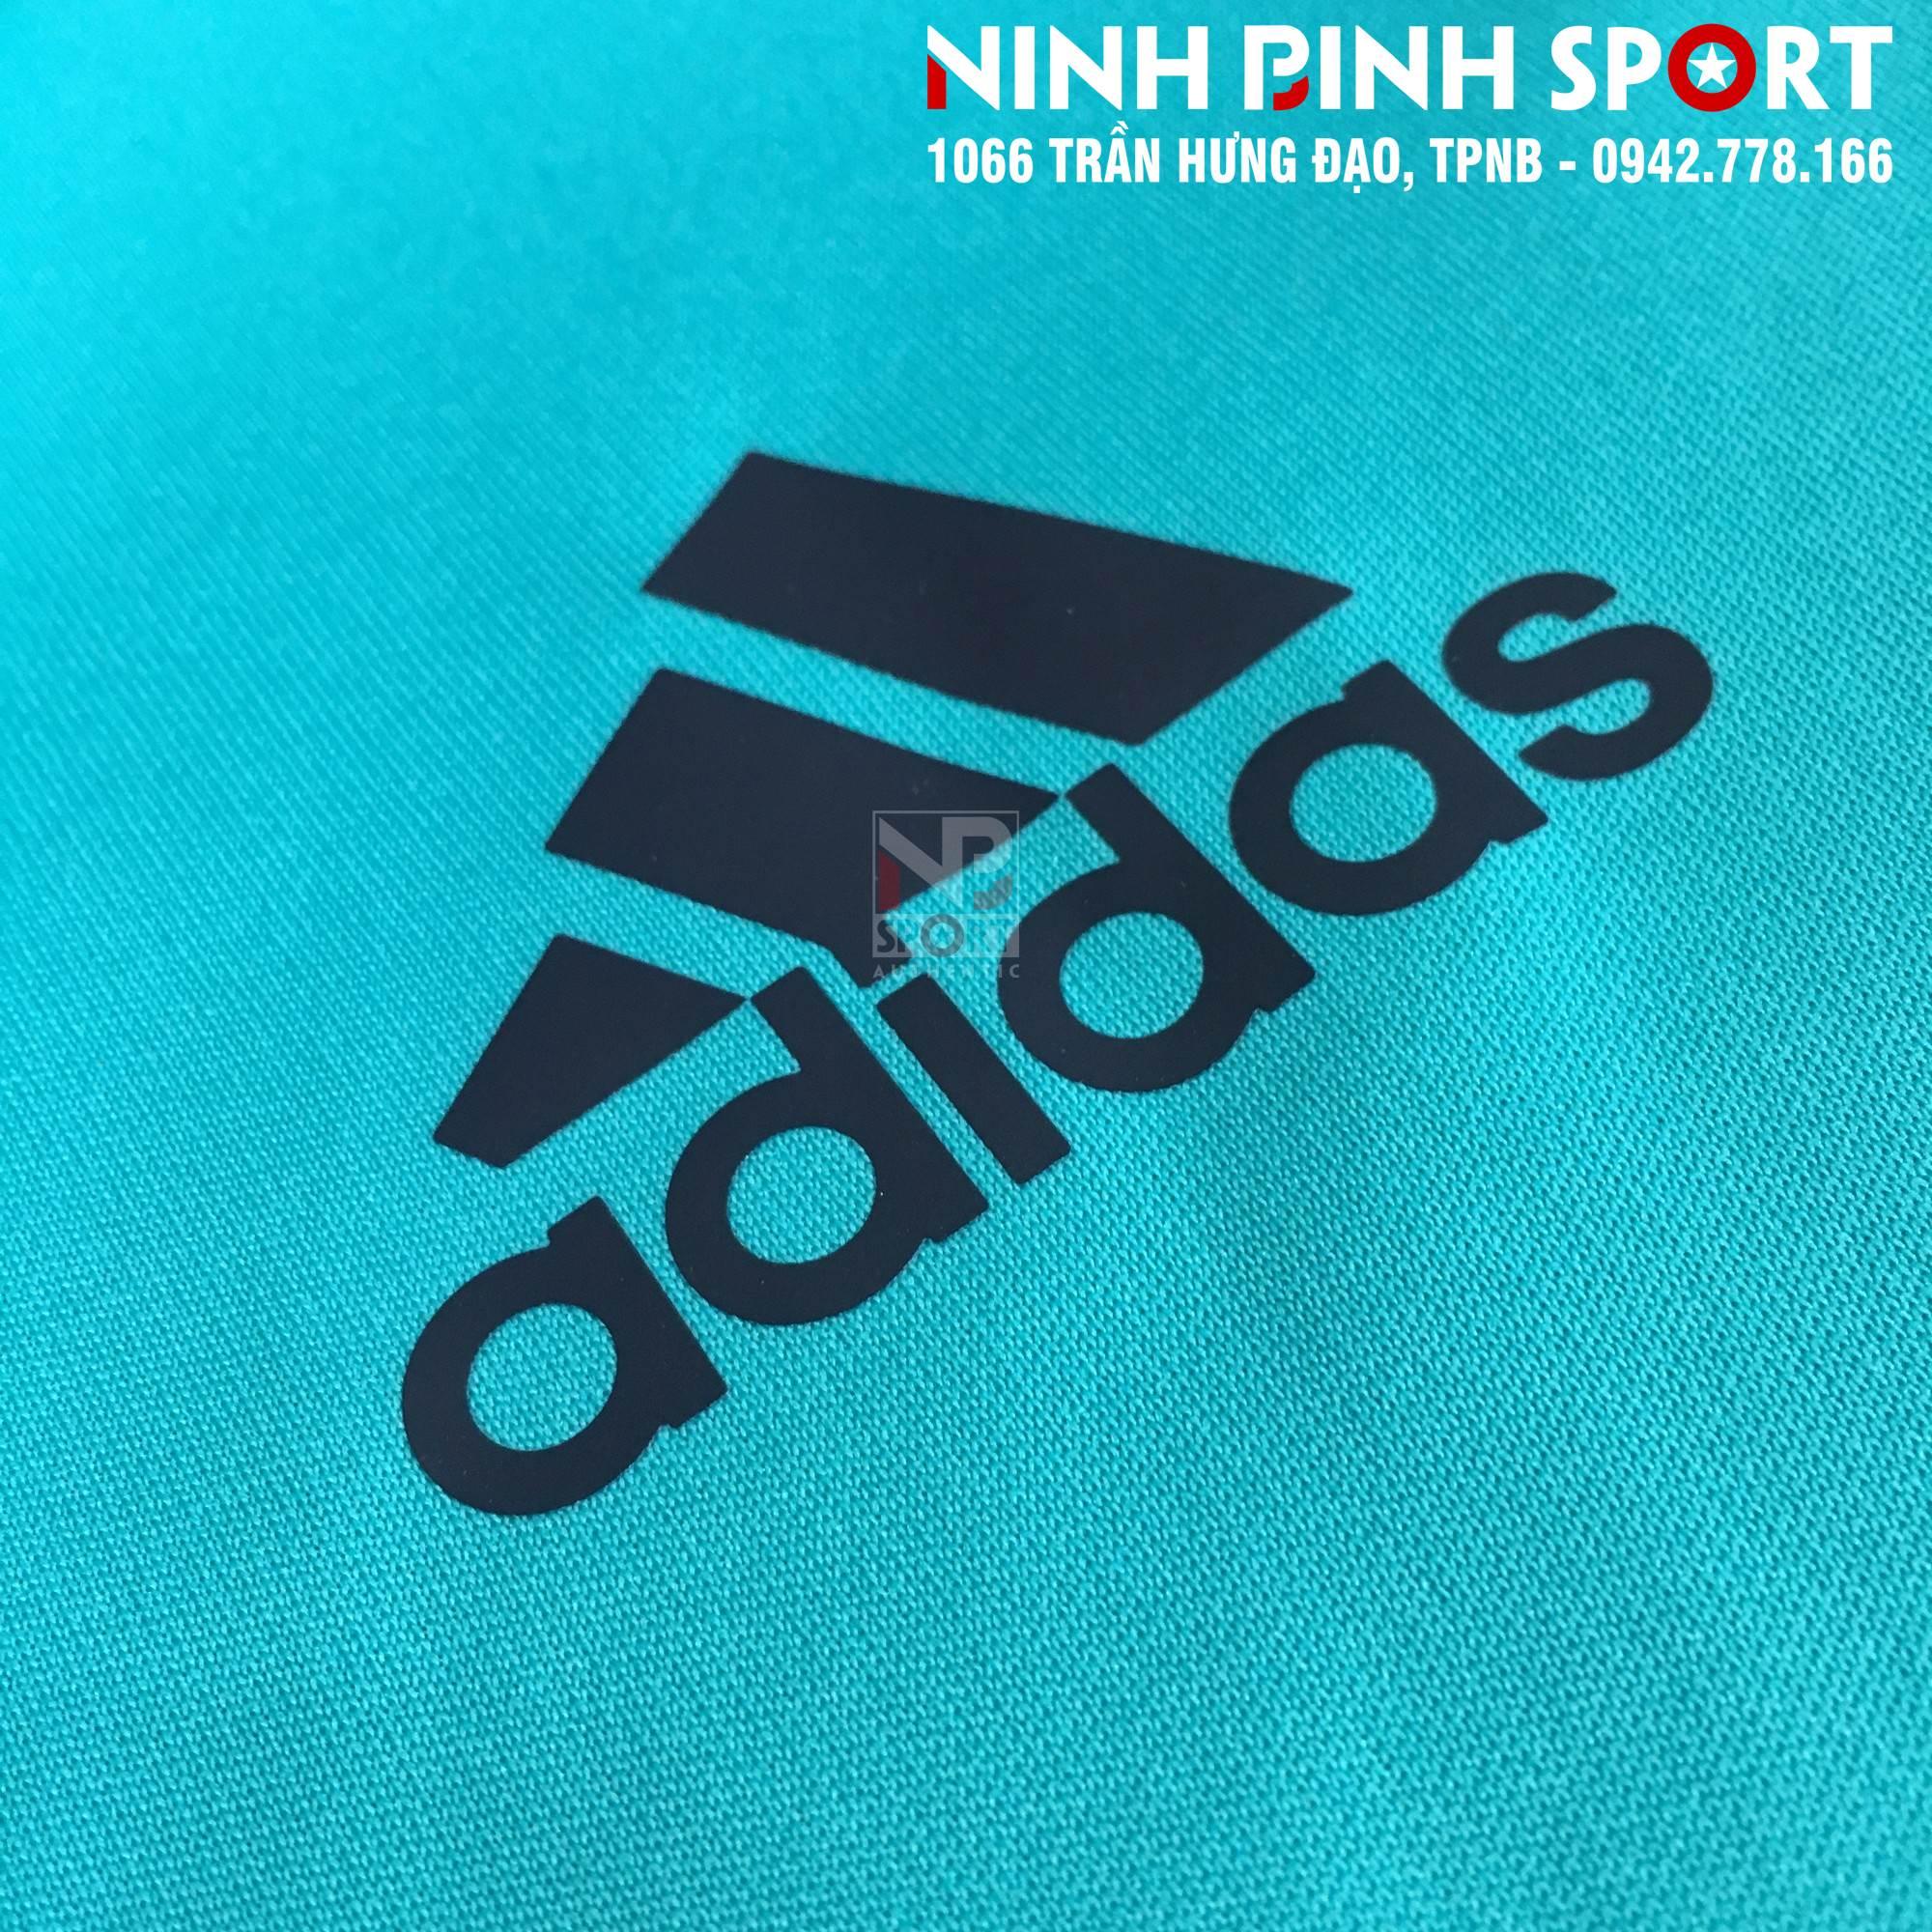 Áo thể thao nam Adidas 3-Stripes Club Tee D93023